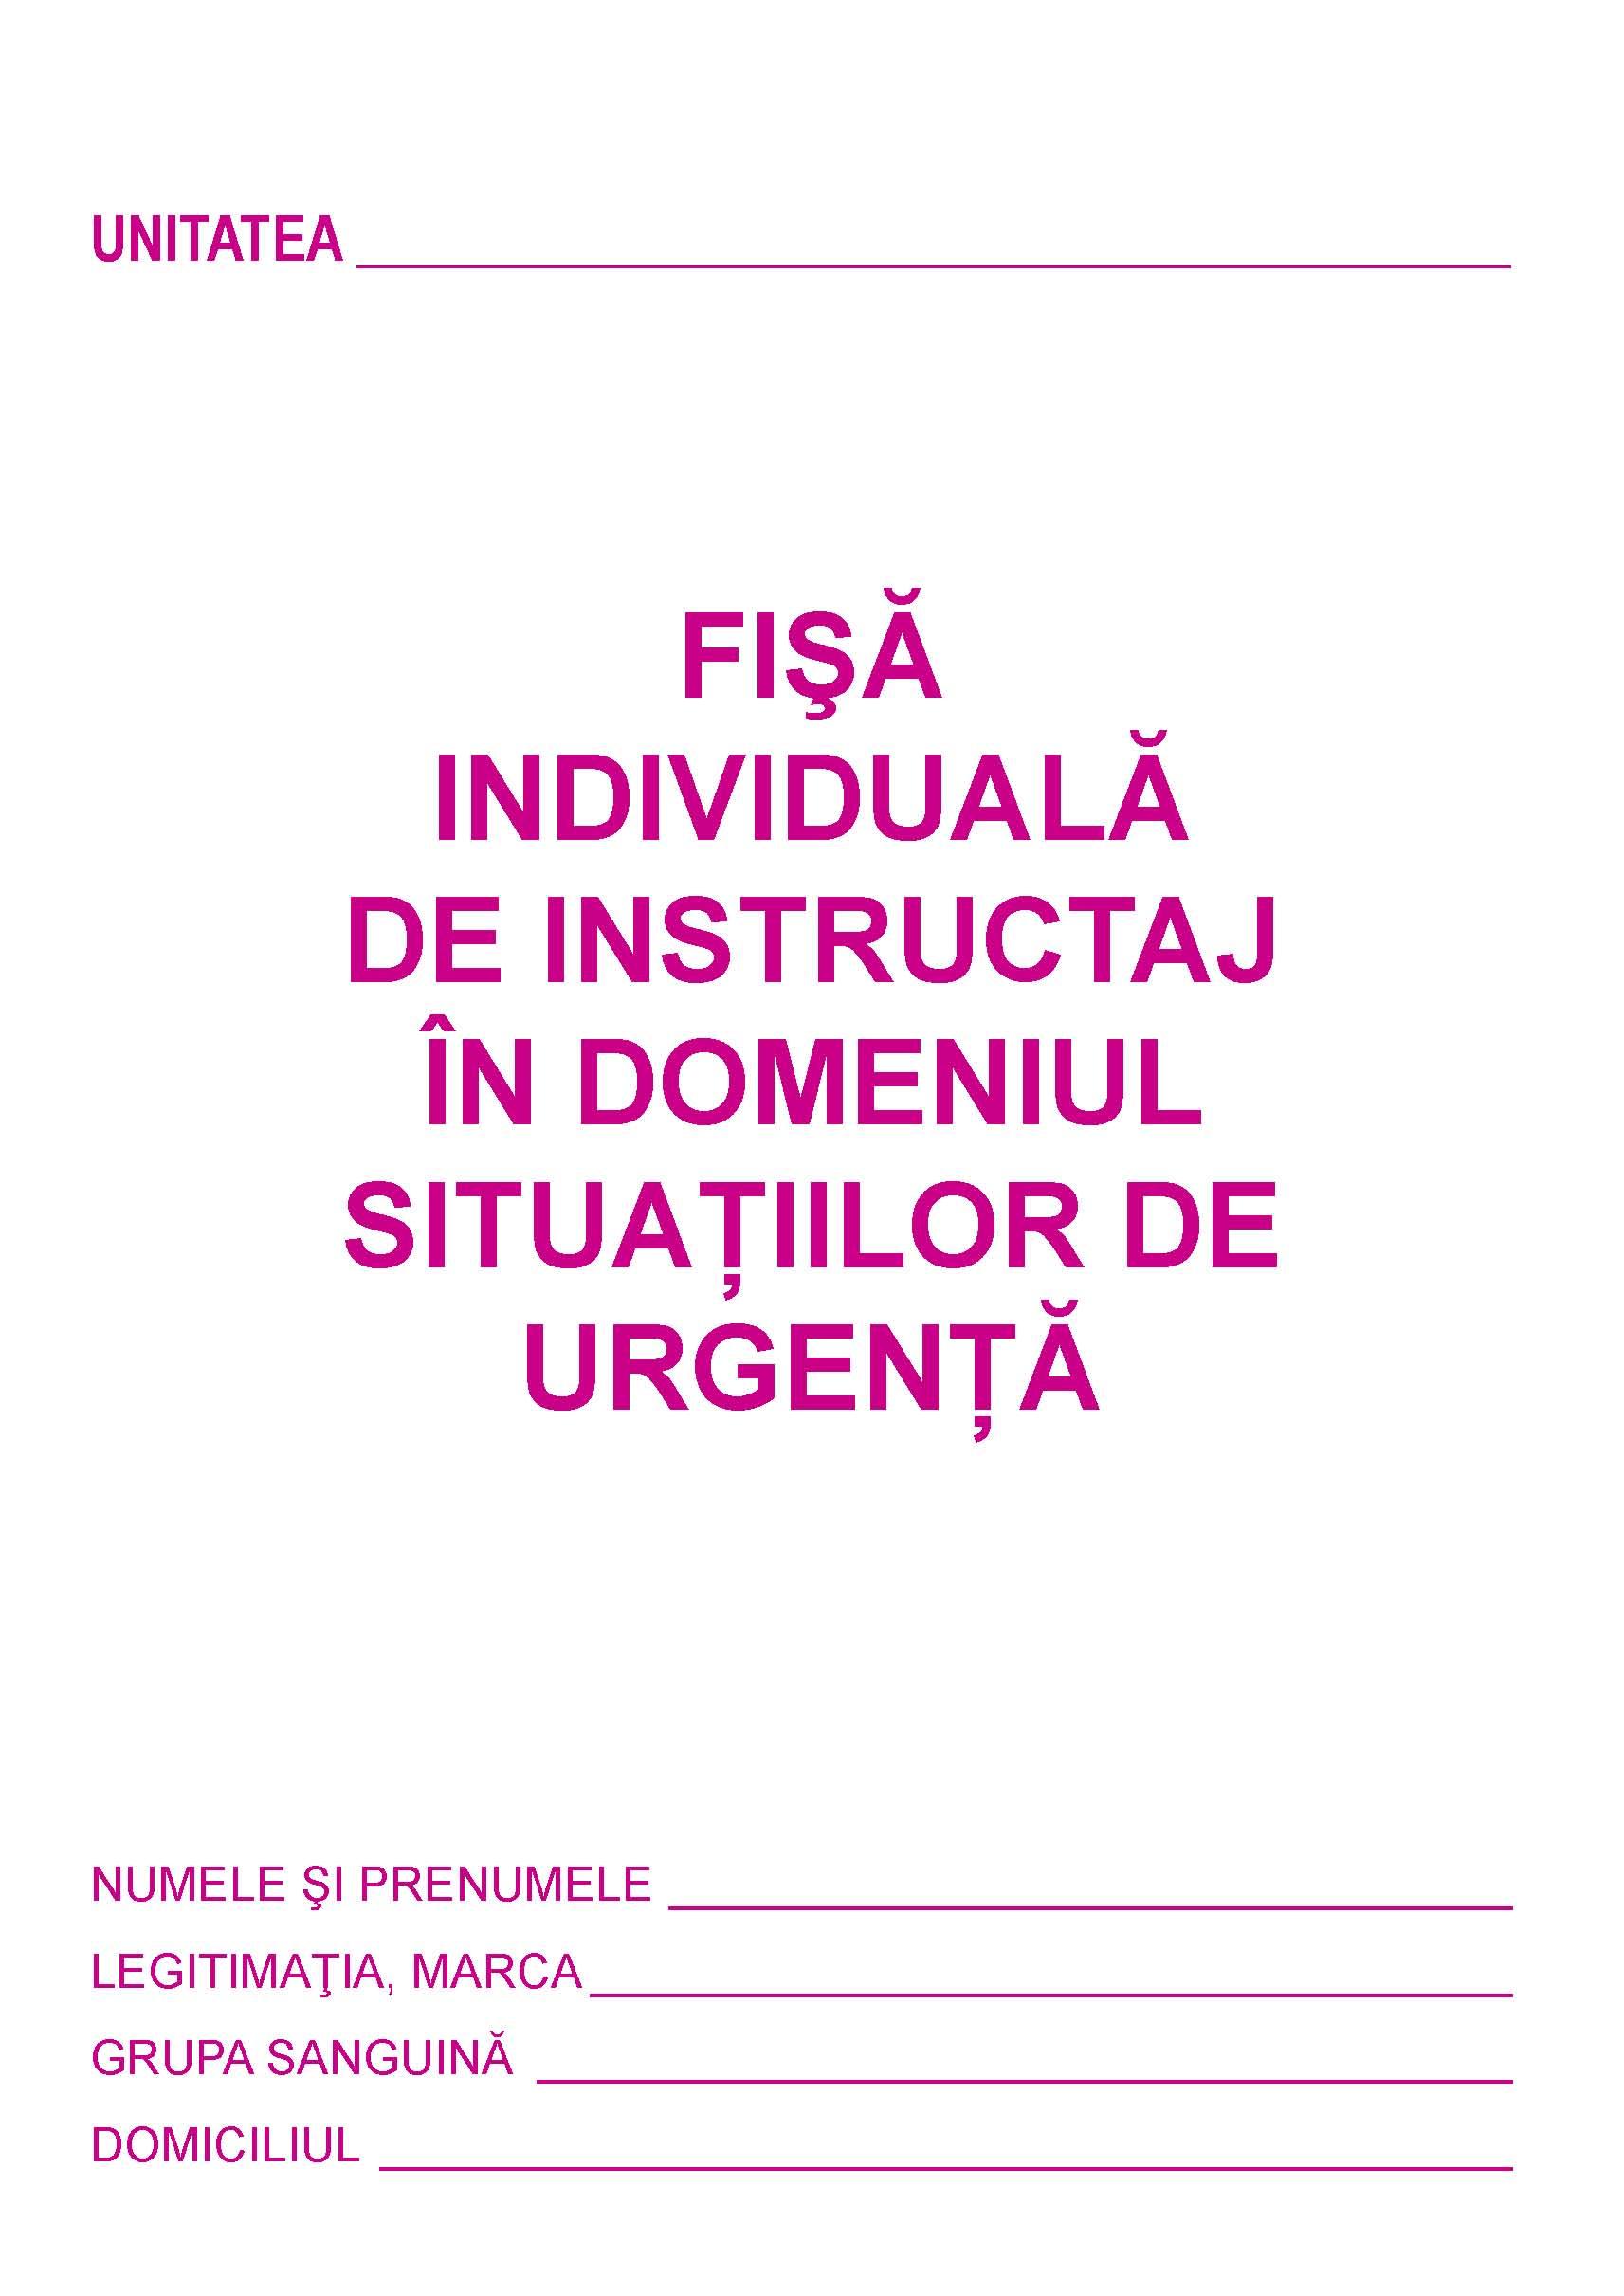 Fisa SU - Fisa de instruire individuala in domeniul Situatiilor de Urgenta